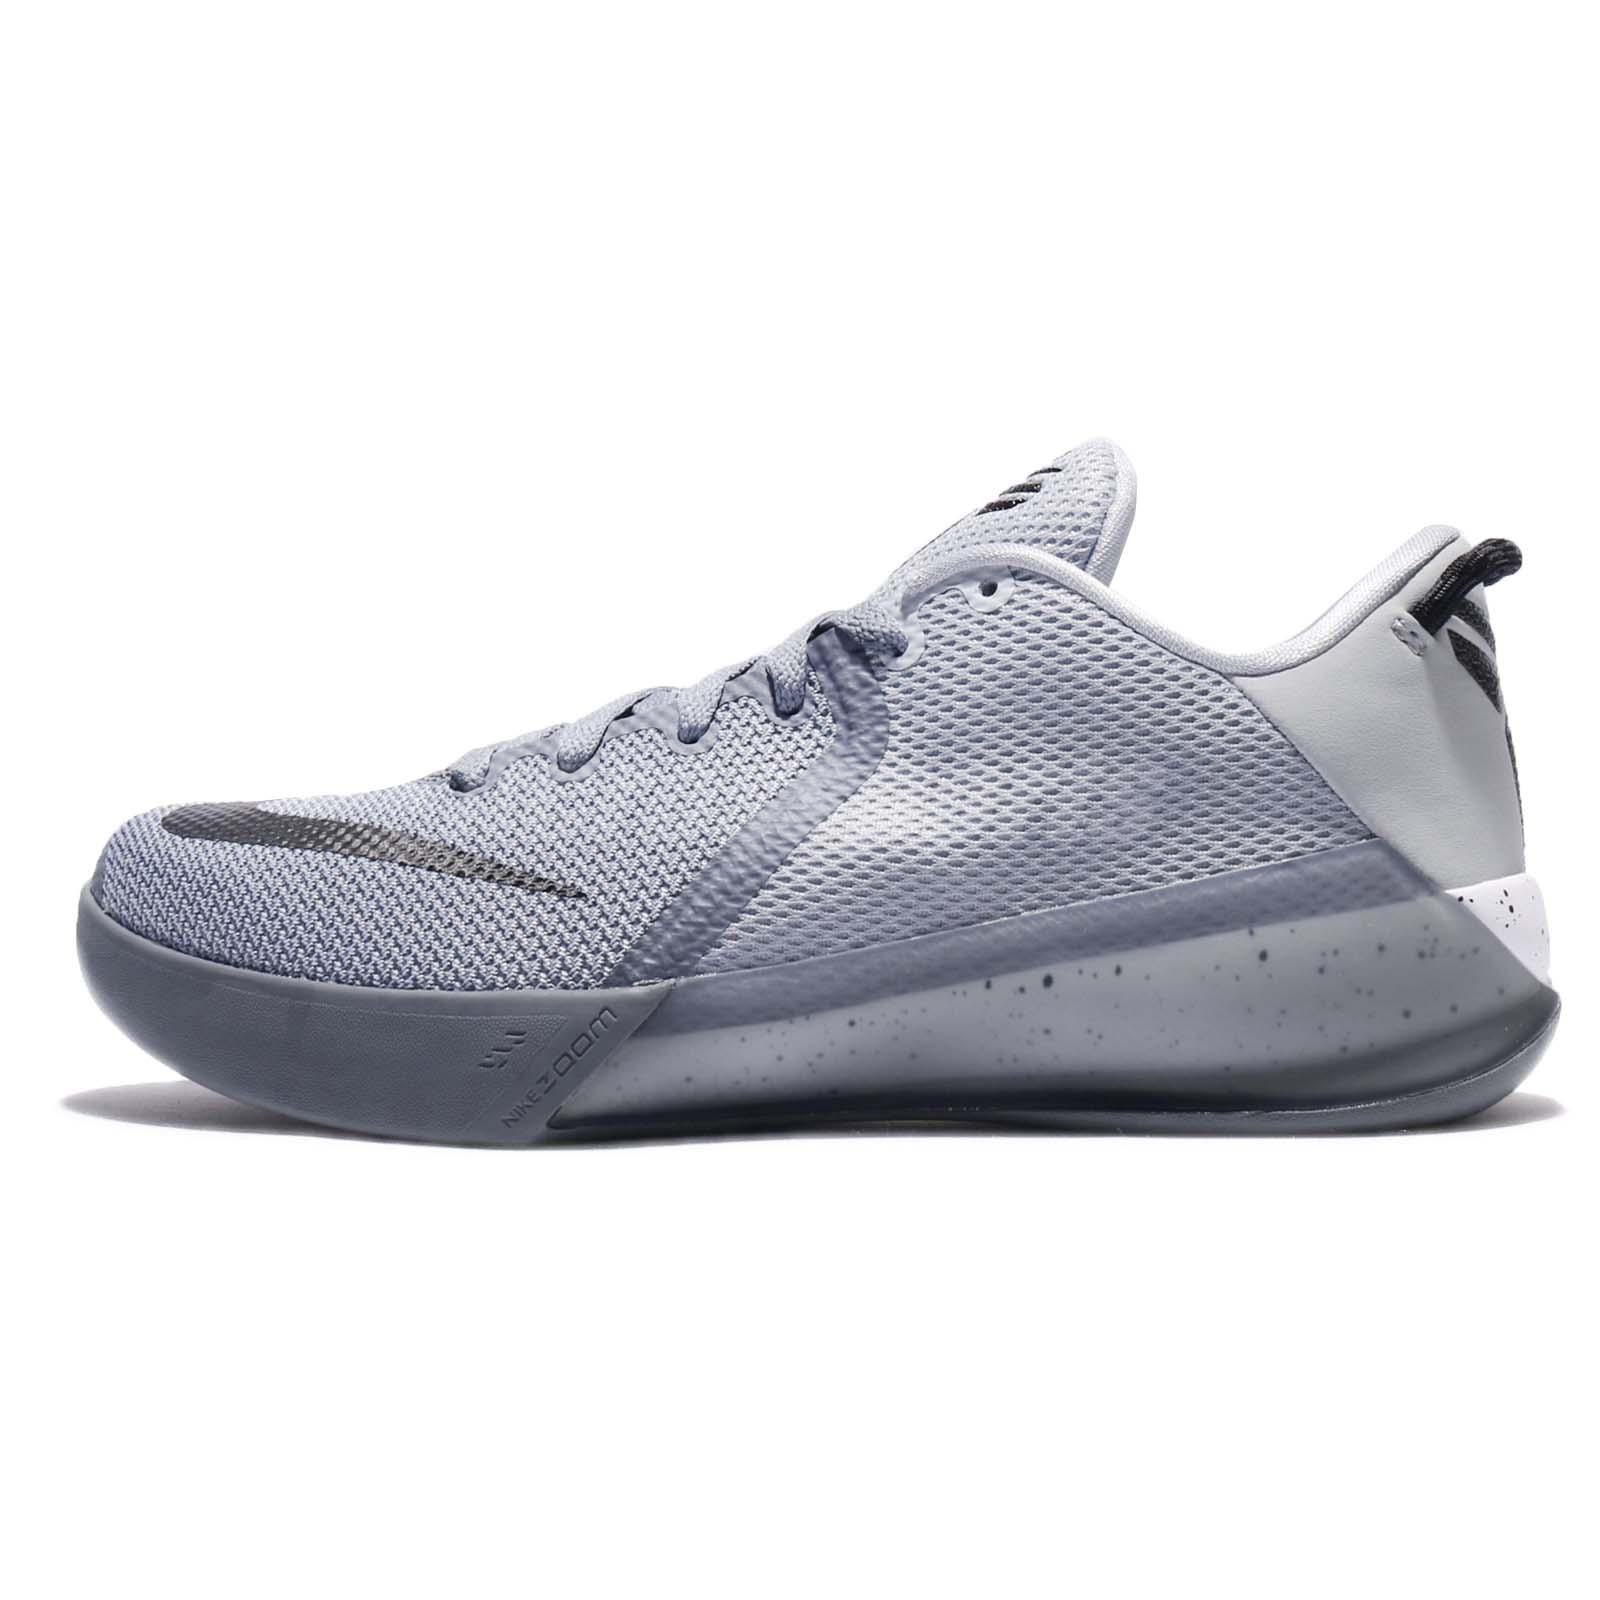 competitive price 73a86 3d556 Nike Zoom Kobe Venomenon 6 VI EP Cool Grey Black Men Basketball Shoes  897657-002 ...